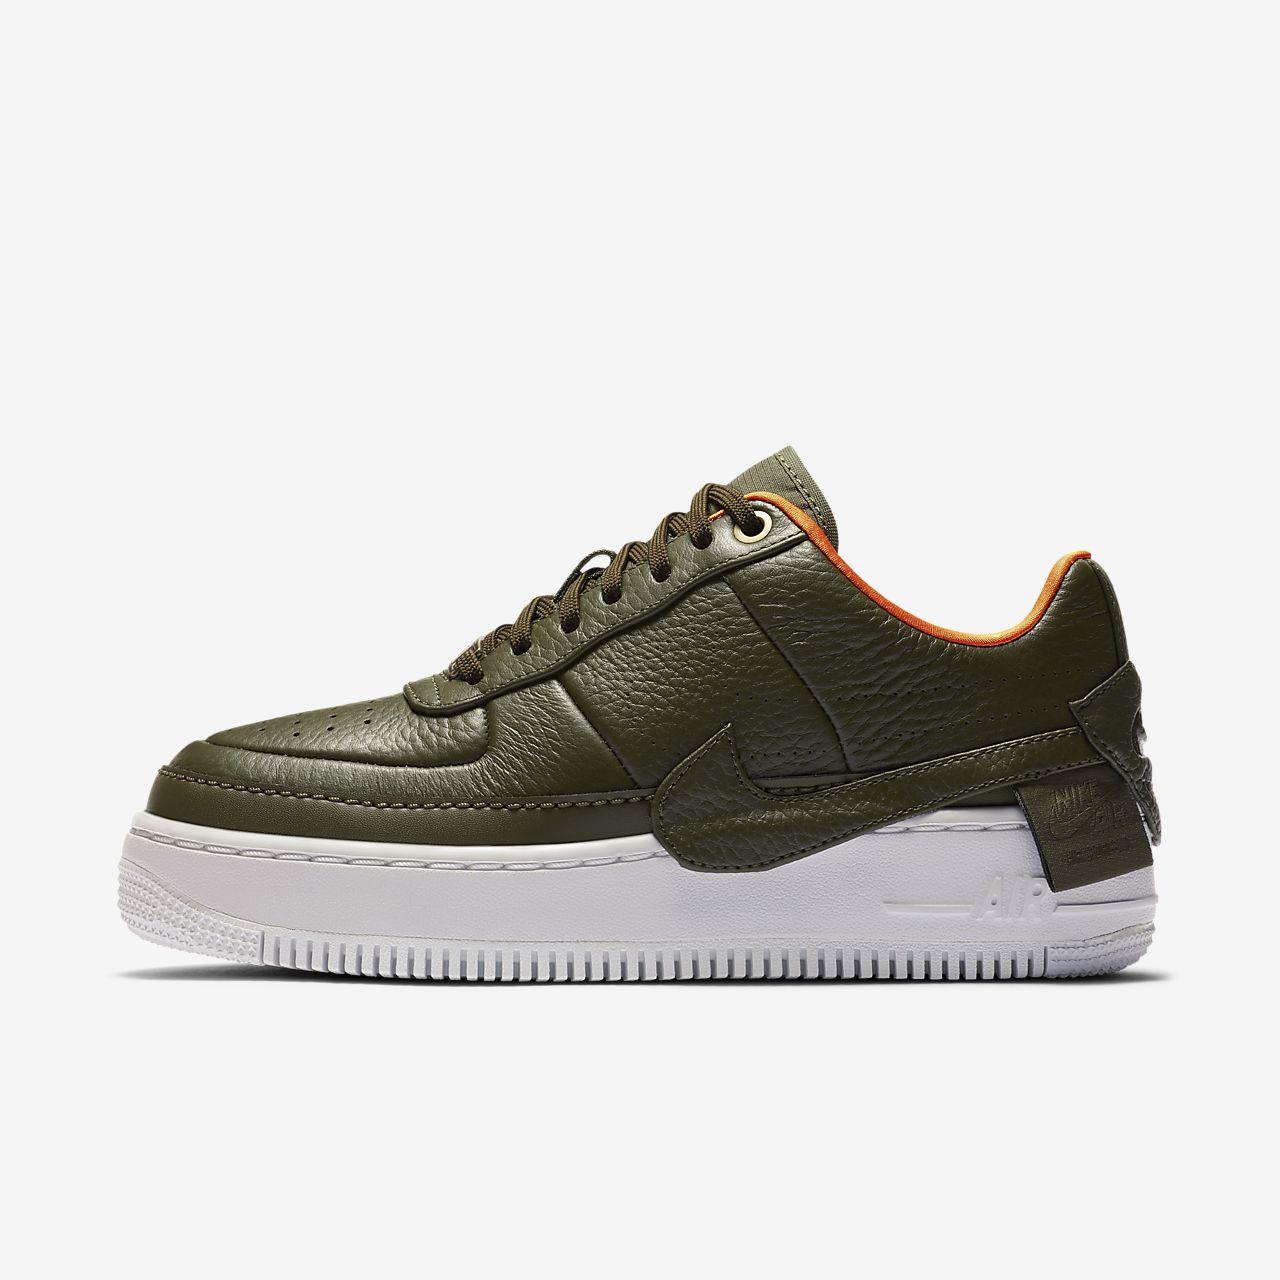 be3b24f64 Sapatilhas Nike Air Force 1 Jester XX Premium para mulher. Nike.com PT